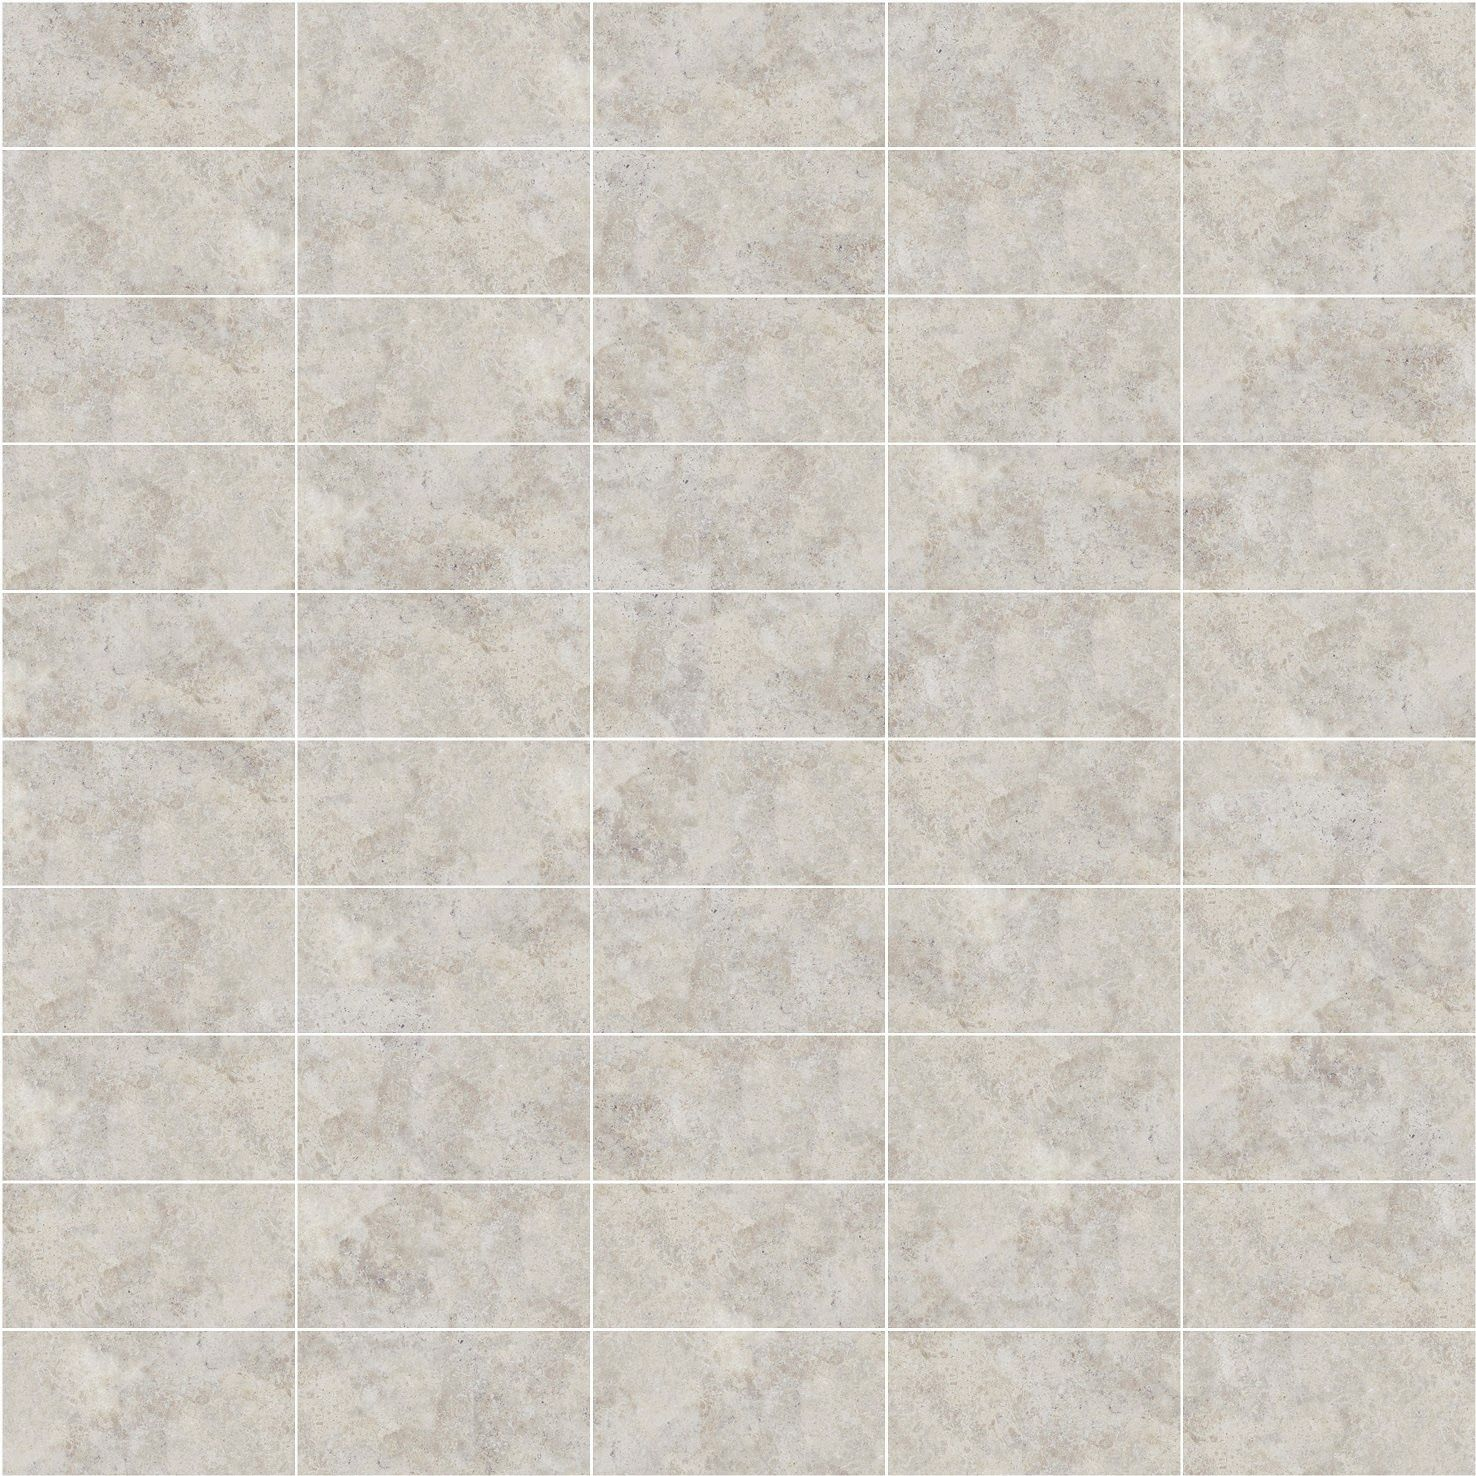 Marble Tile Floor Texture texture seamless marble floor tile | texture floor tile